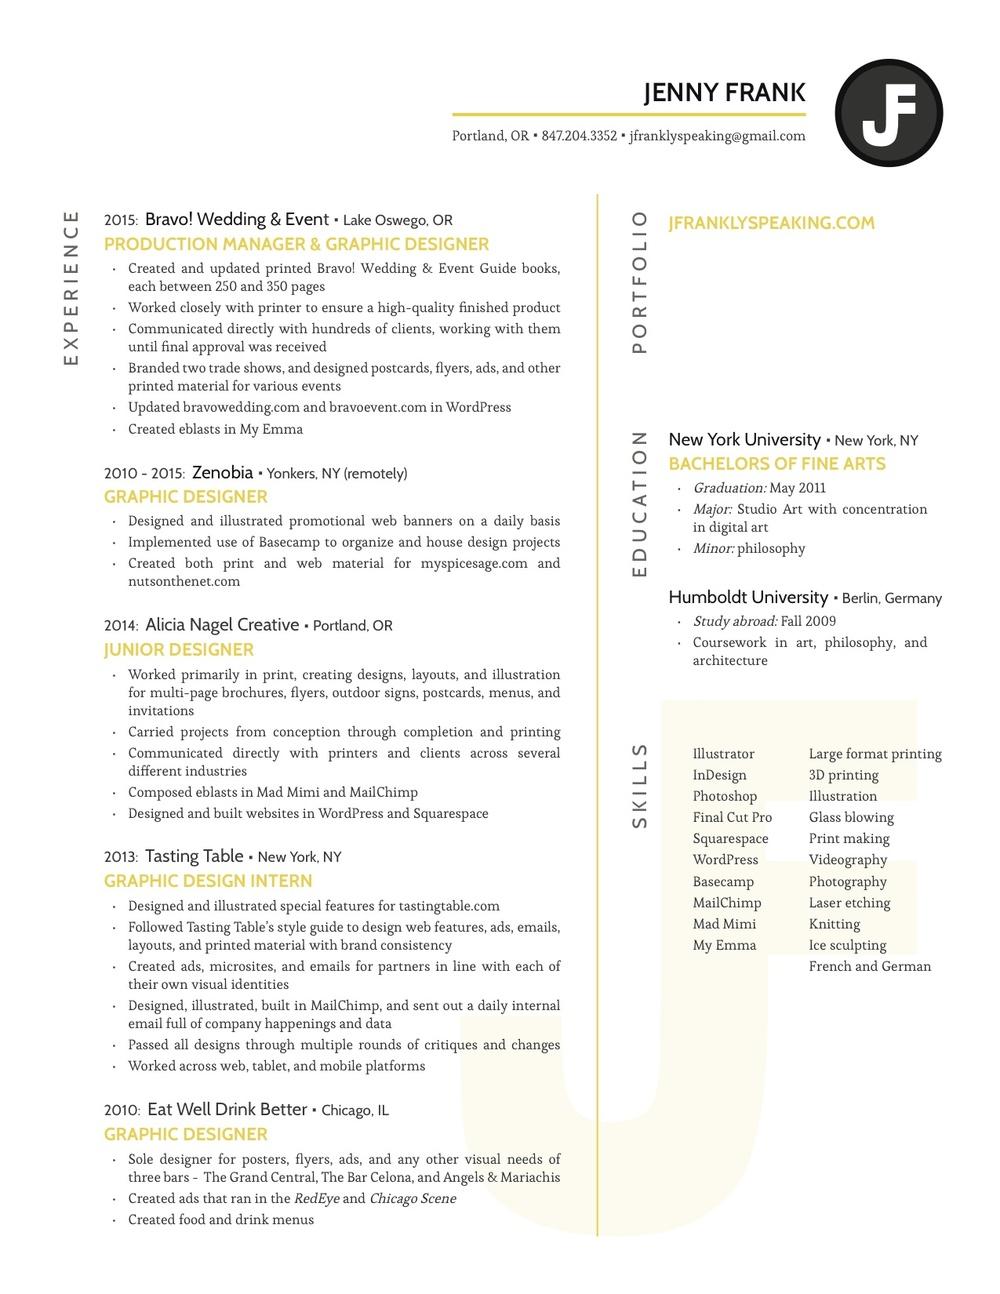 JennyFrank_resume.jpg